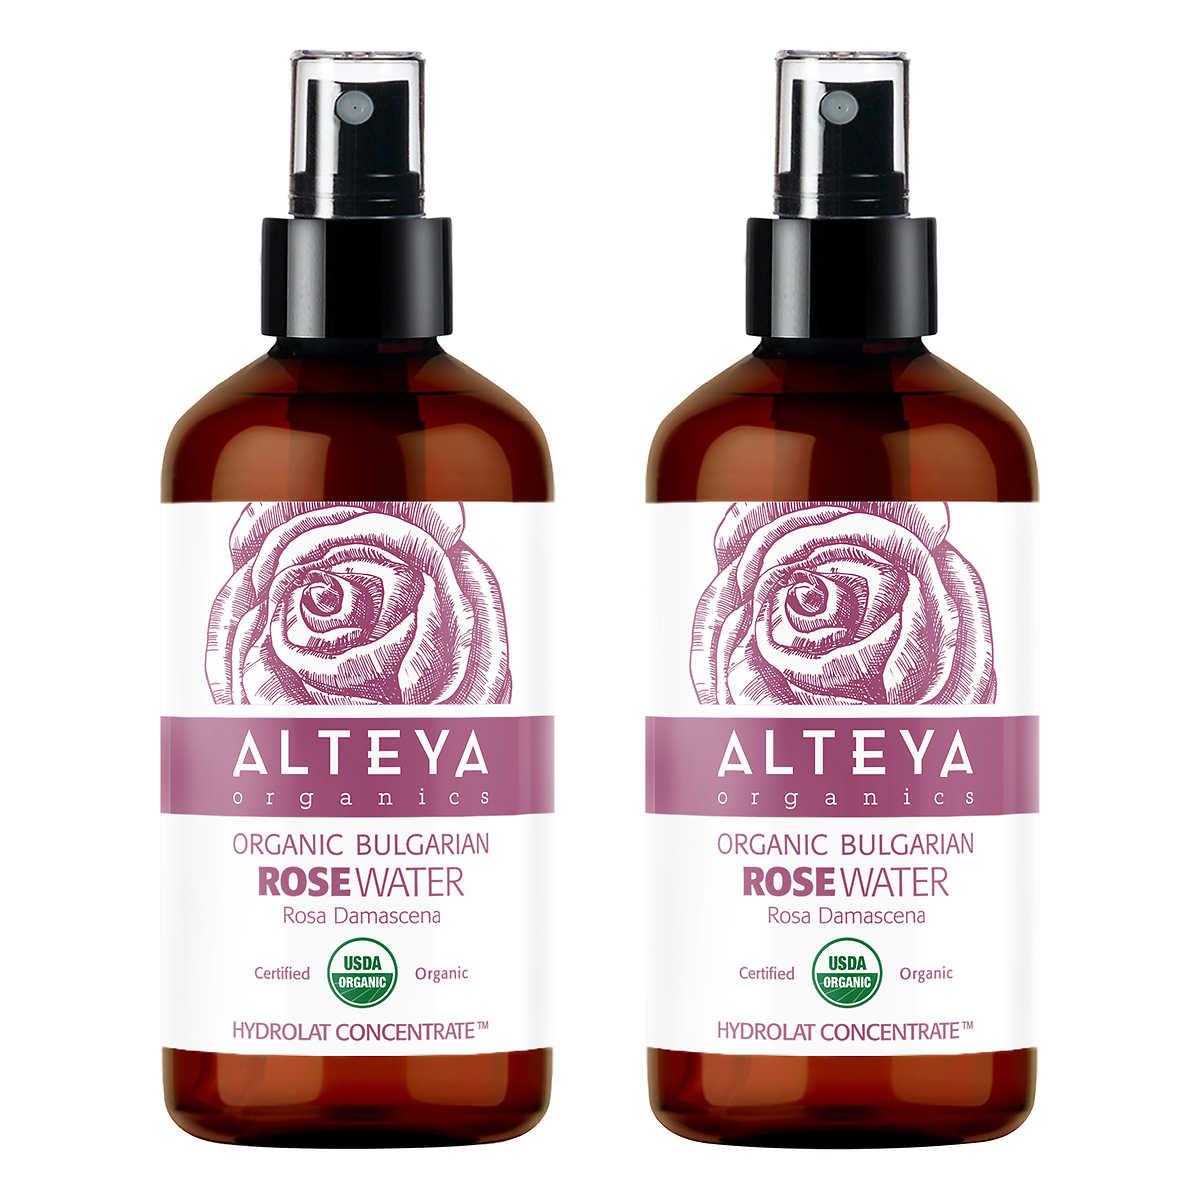 Alteya Organics Bulgarian Rose Water 8 0 fl oz, 2-pack